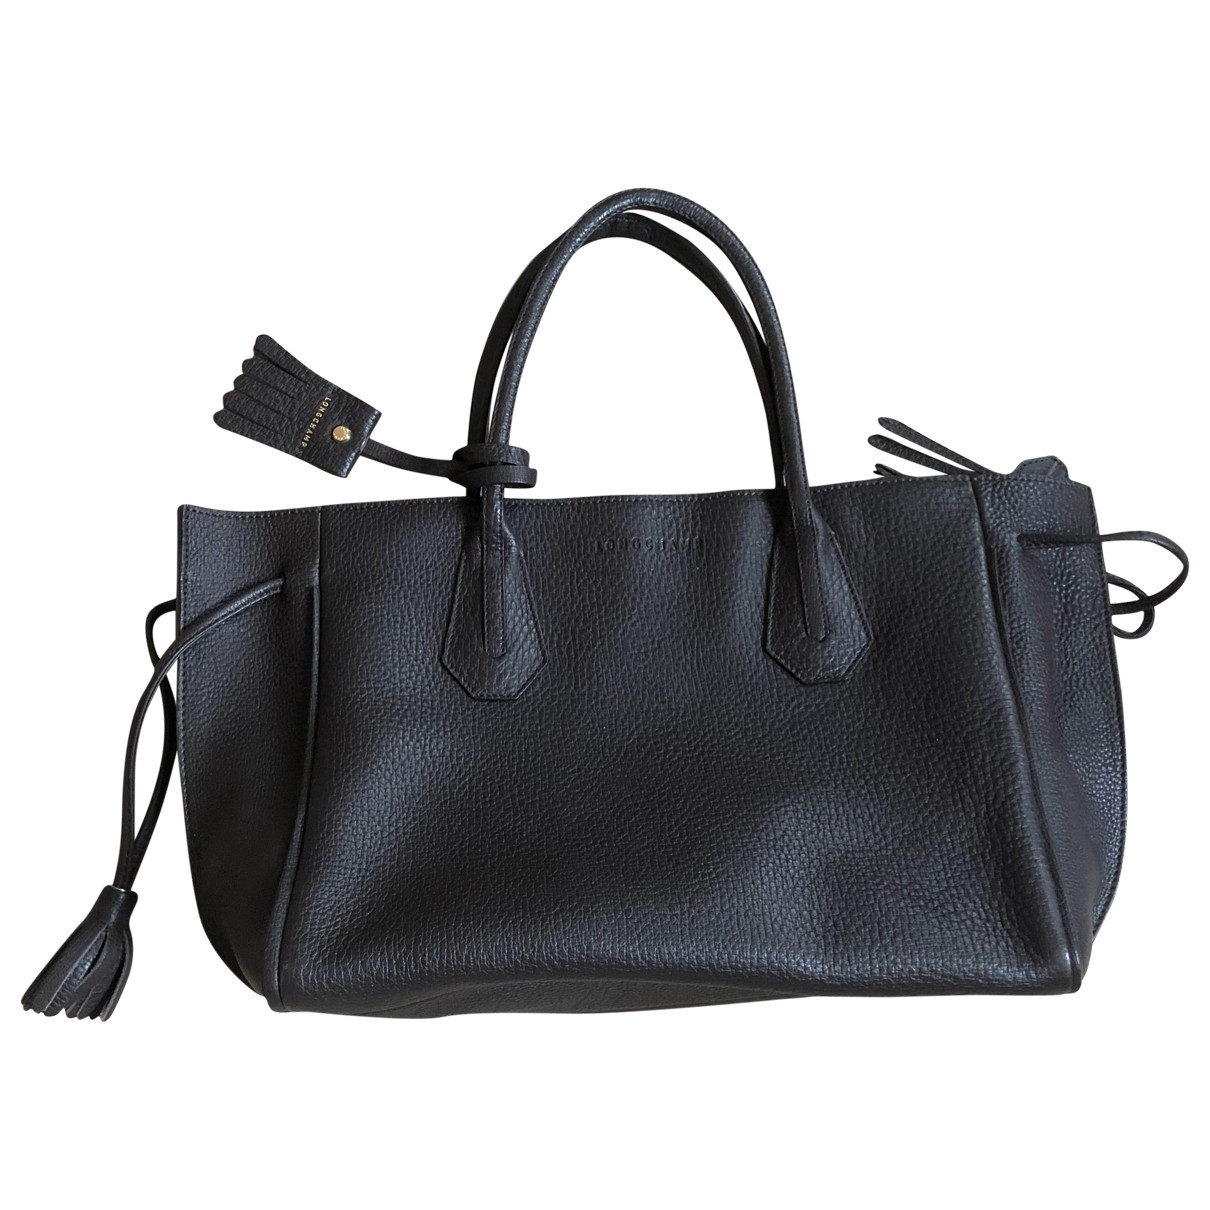 Longchamp \N Brown Leather handbag for Women \N